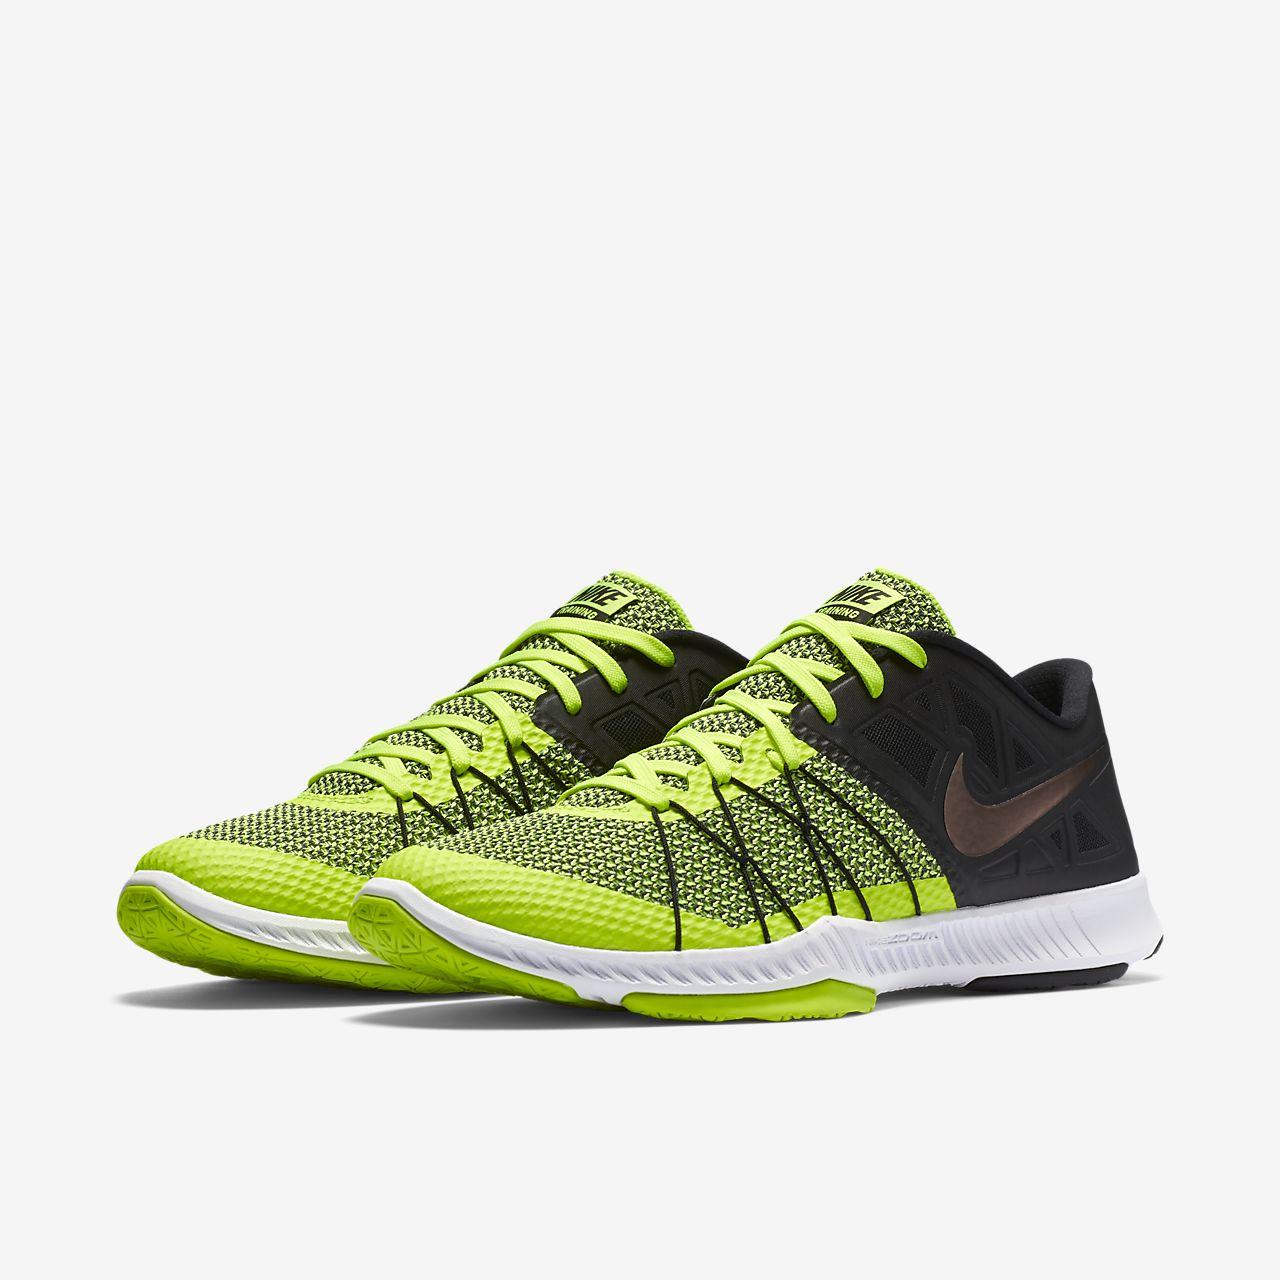 ... Nike Zoom Train Incredibly Fast Herren-Trainingsschuh